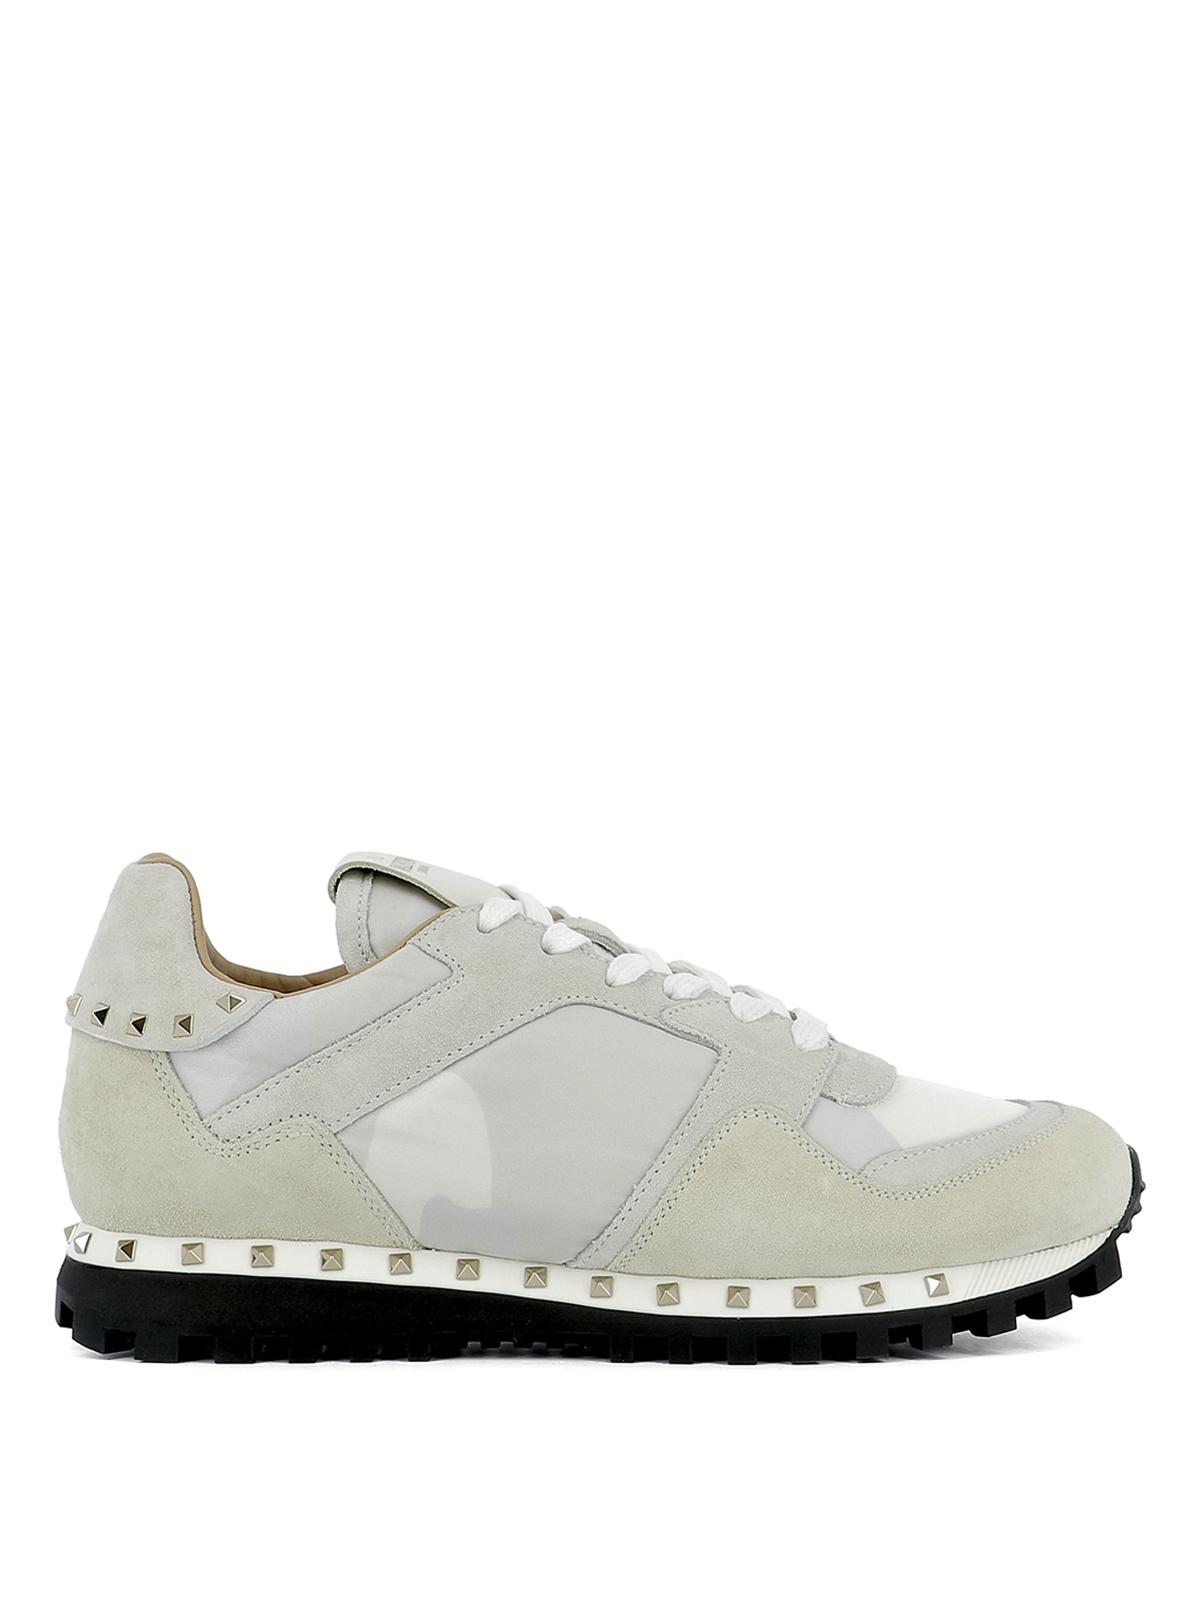 valentino garavani rockstud sneakers trainers mw2s0b51nyma00. Black Bedroom Furniture Sets. Home Design Ideas